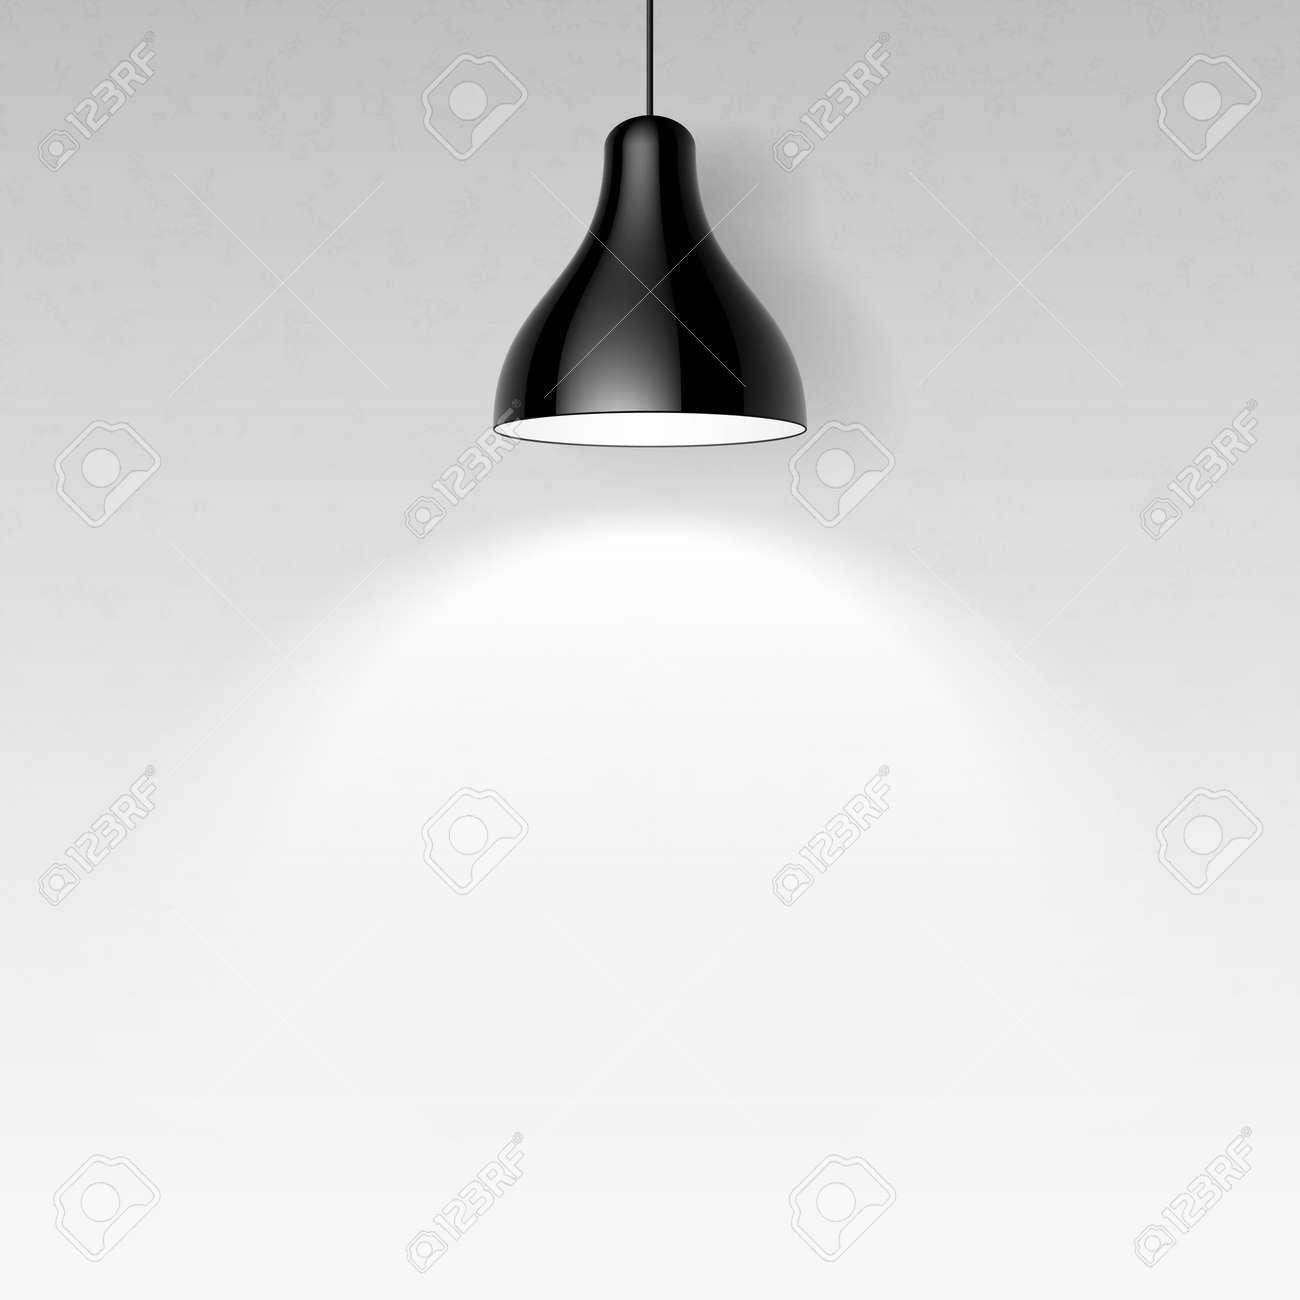 Black ceiling lamp - 22397154